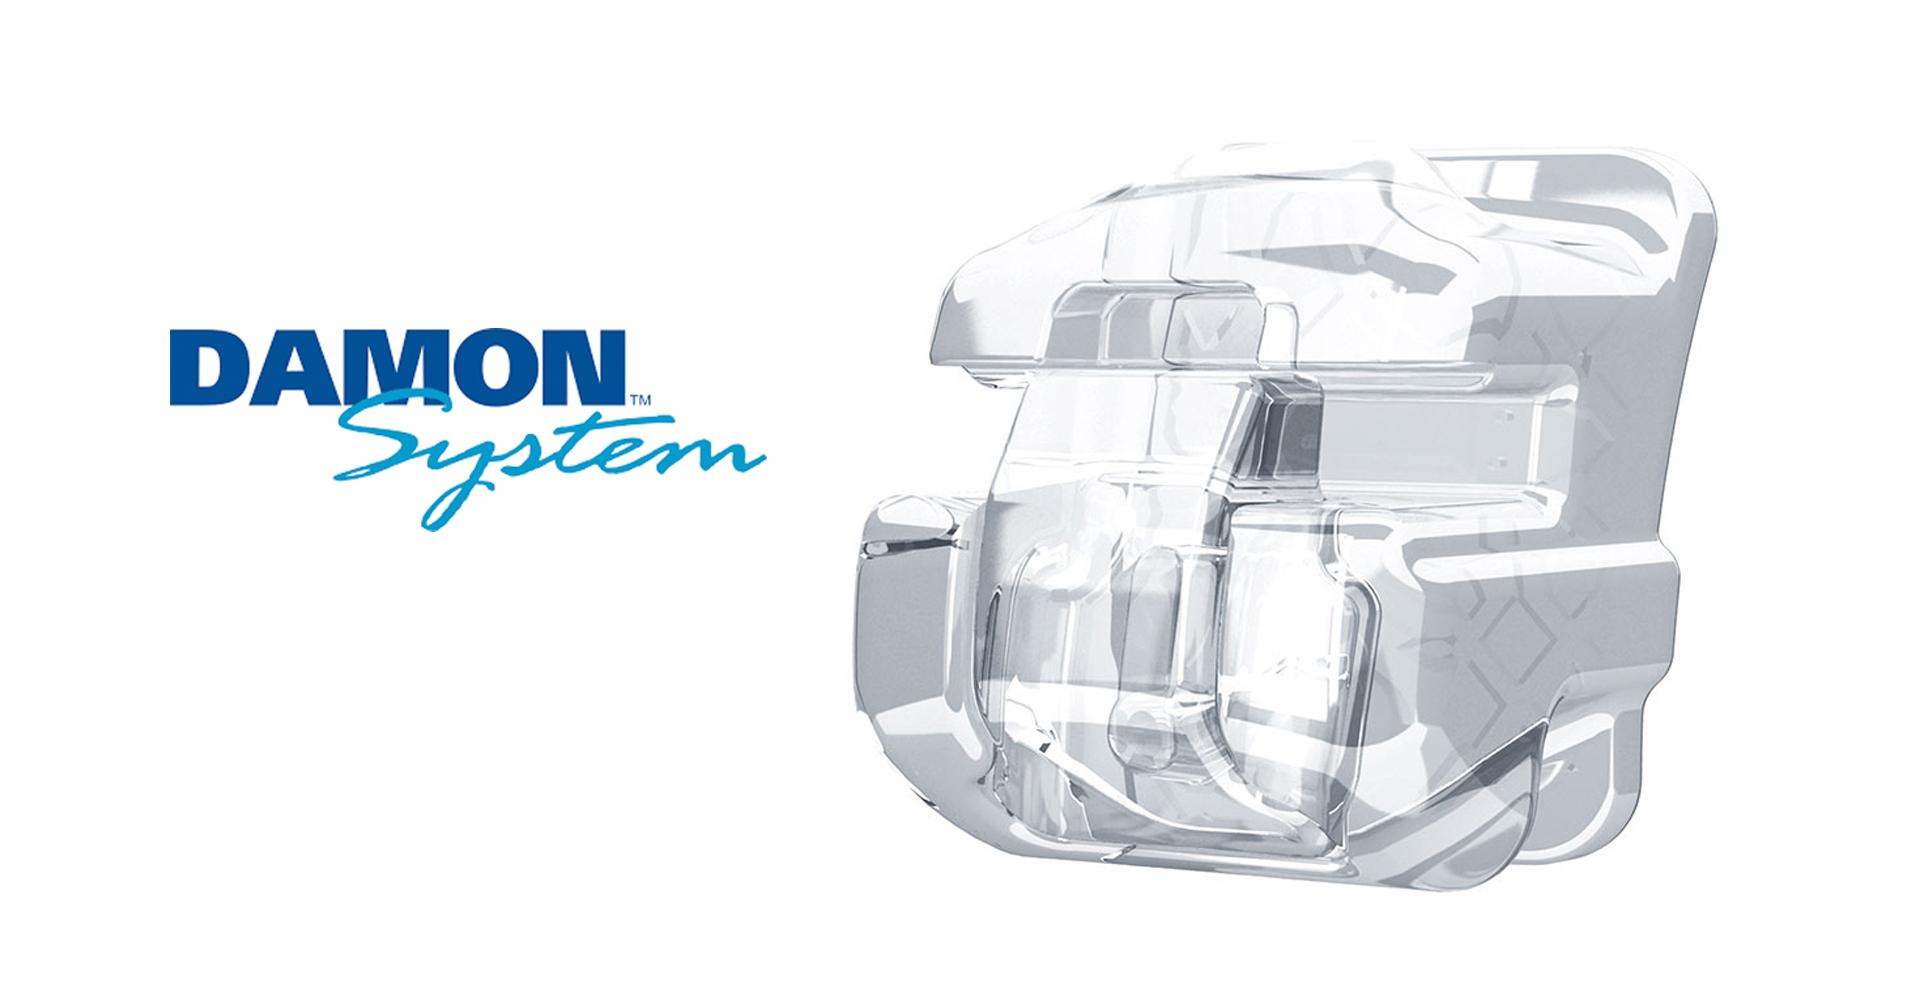 damon-system-orthodontics-1920x1280px